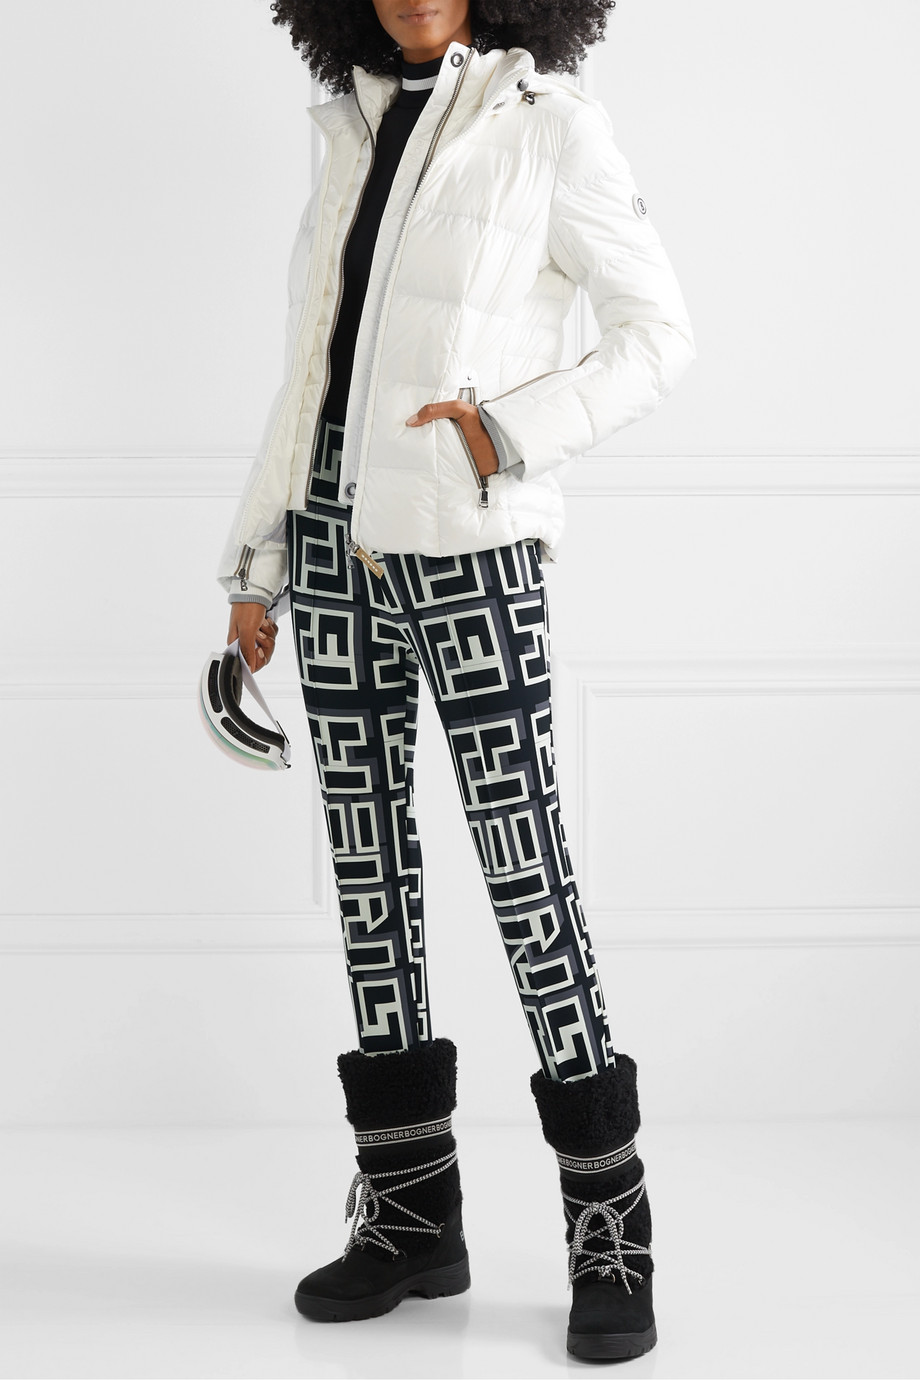 Bogner Elaine printed stretch stirrup ski pants